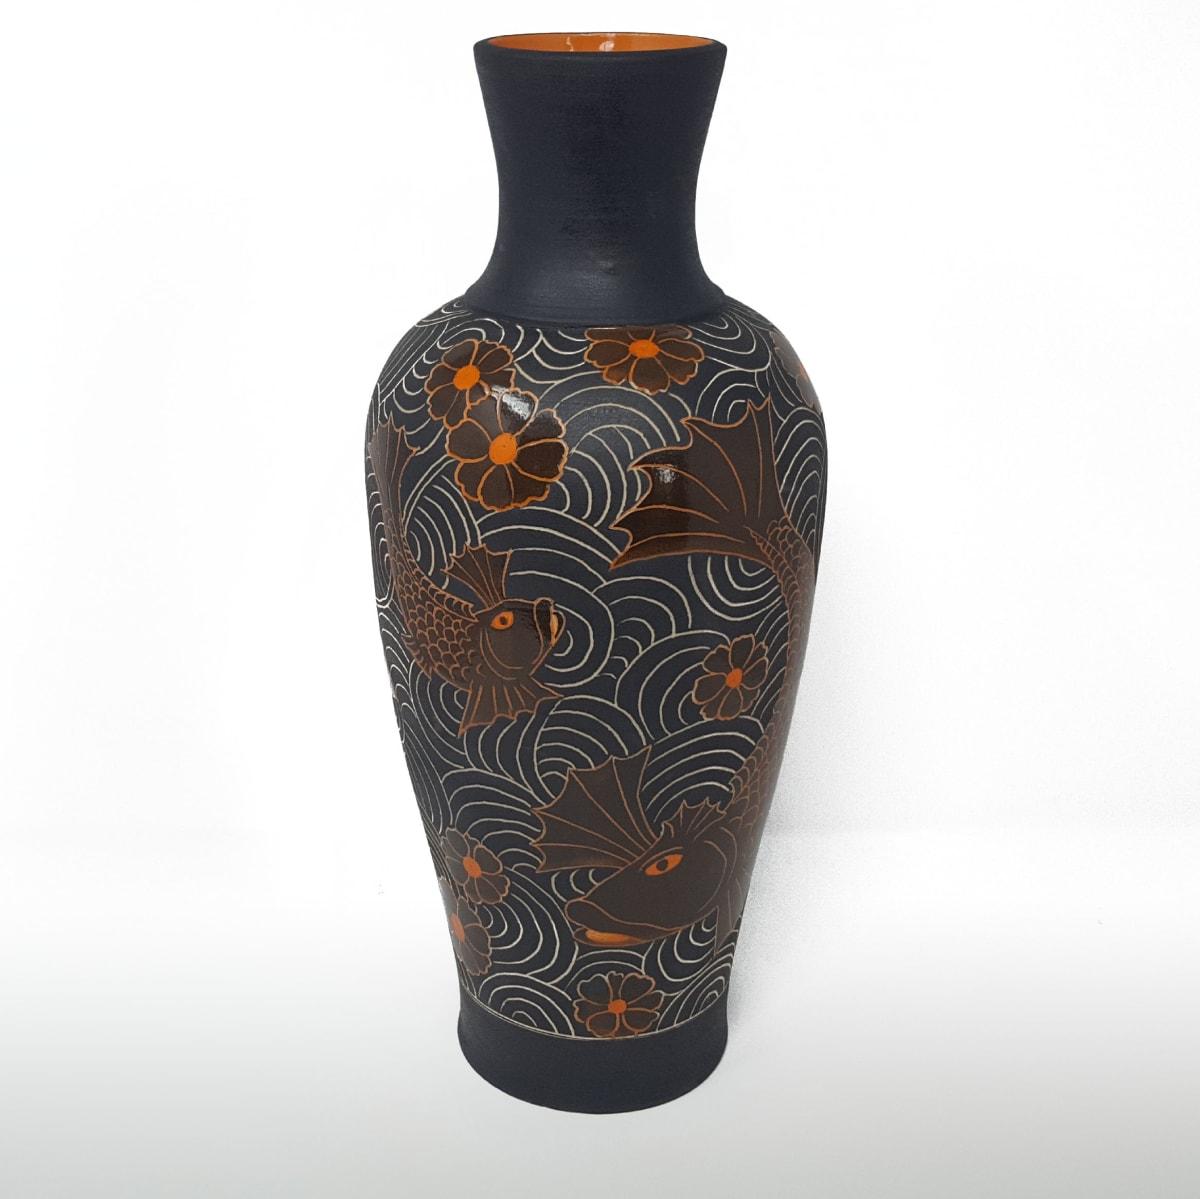 BRI064, Tall Fighting Fish Vase by Jane Bridger